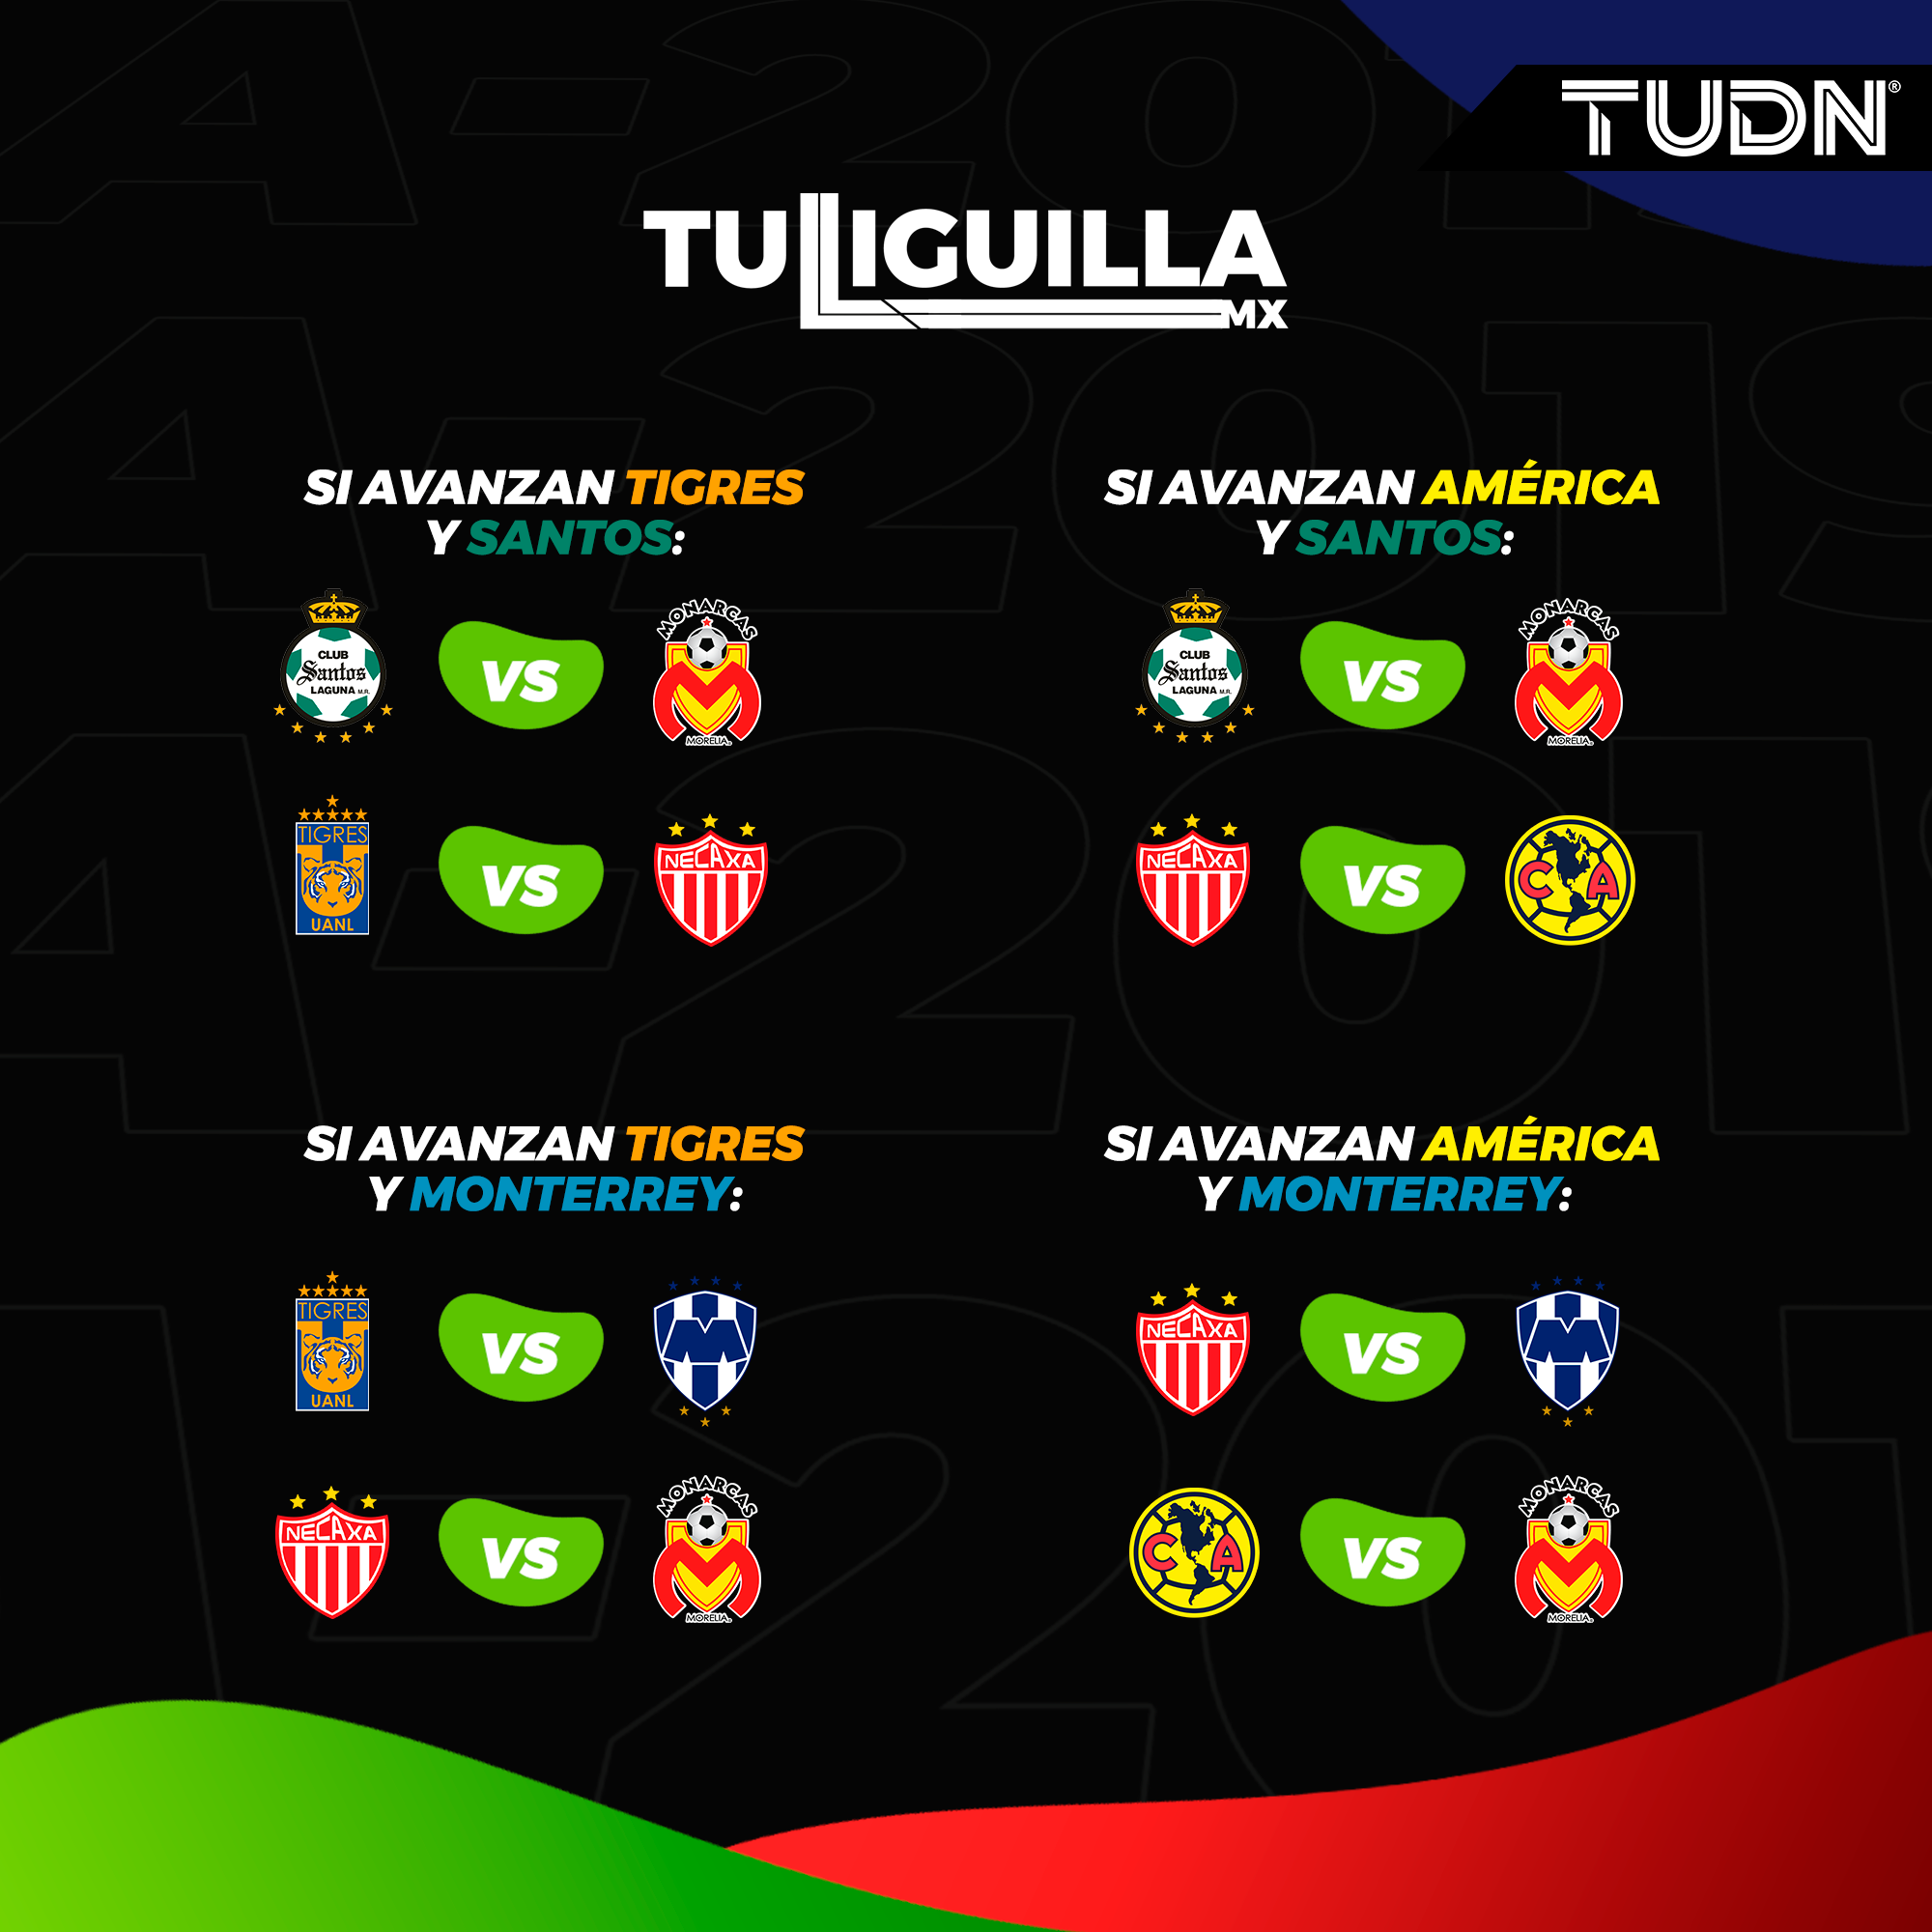 semifinales de la liga mx 2020